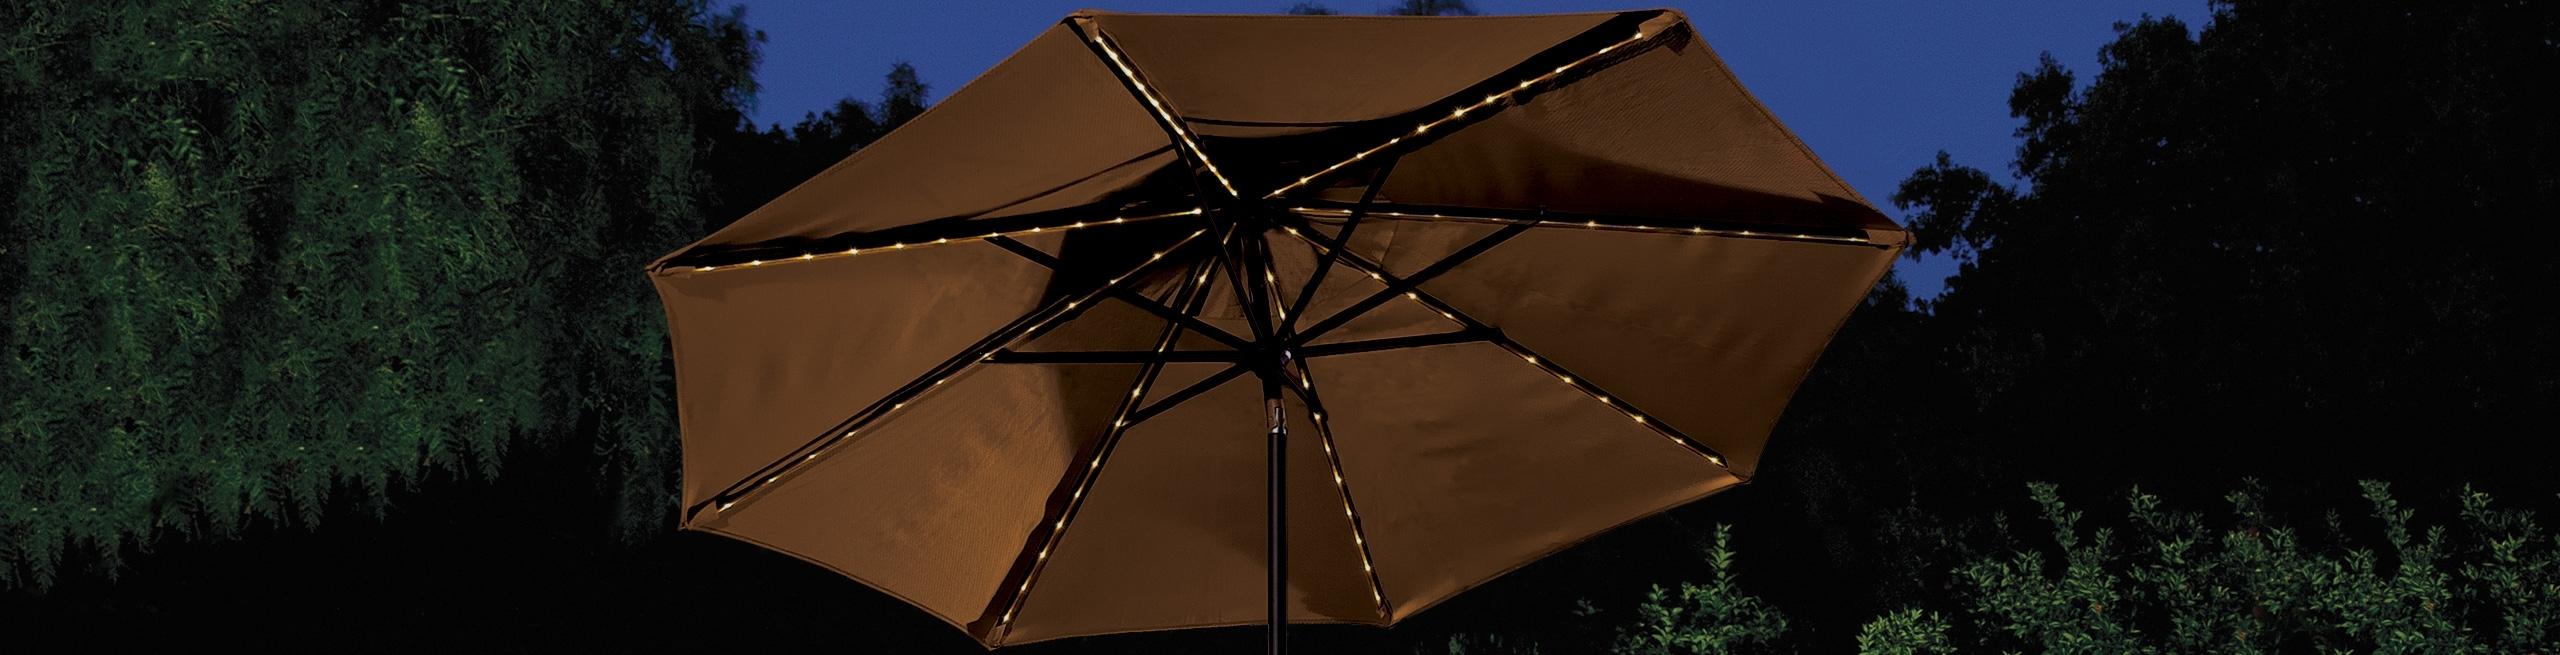 Recent Treasure Garden: Treasure Garden Umbrellas (View 18 of 20)